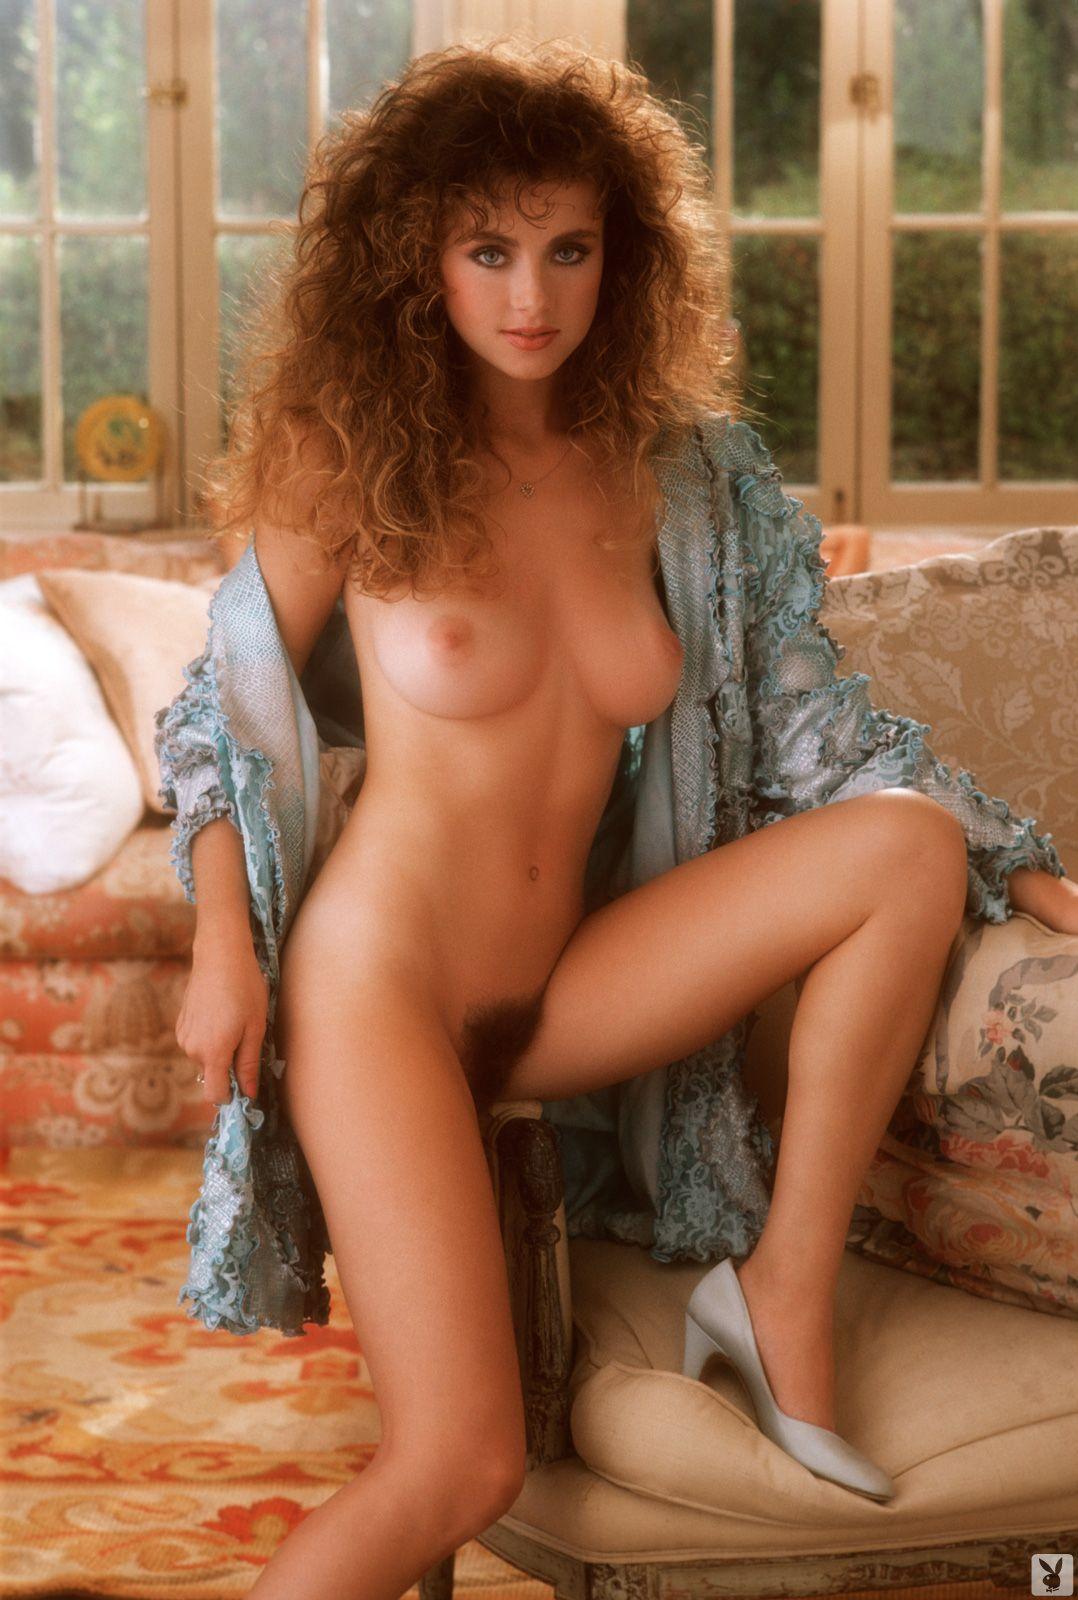 Playboy centerfold sherry arnett